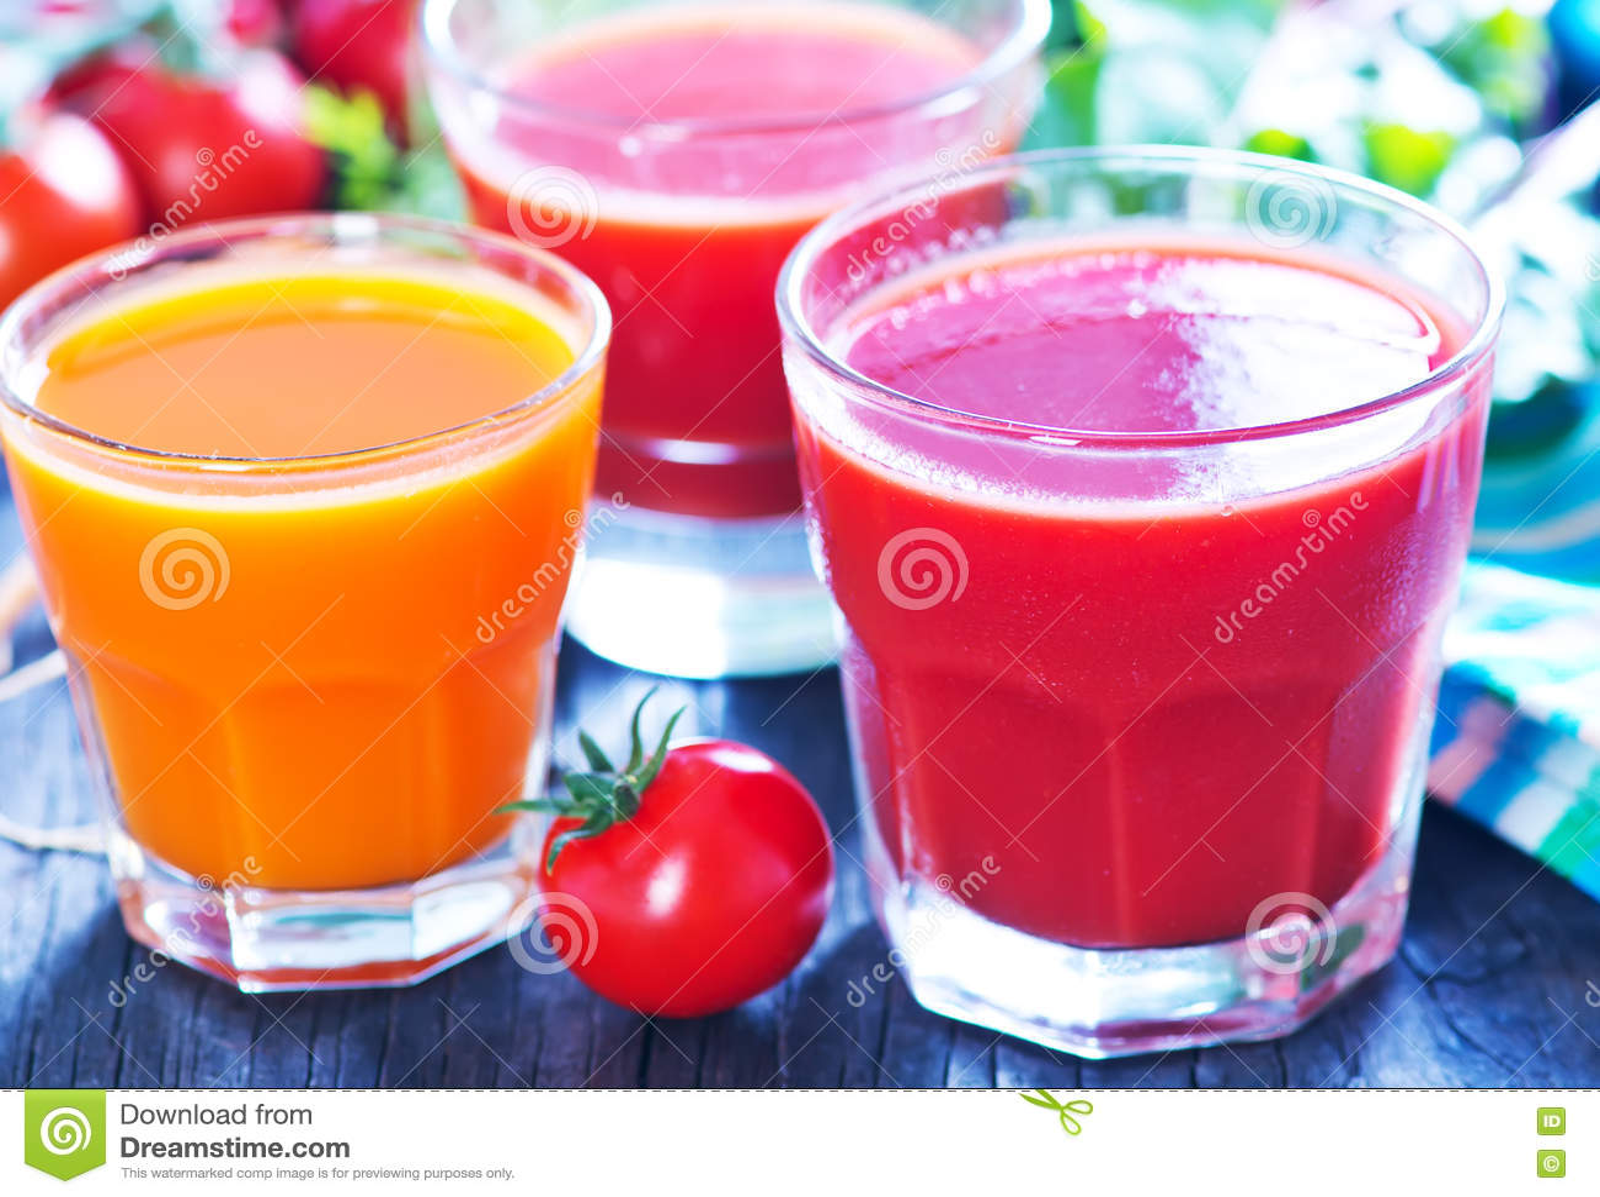 Download Vegetable сок стоковое изображение. изображение насчитывающей жидкость - 72293573